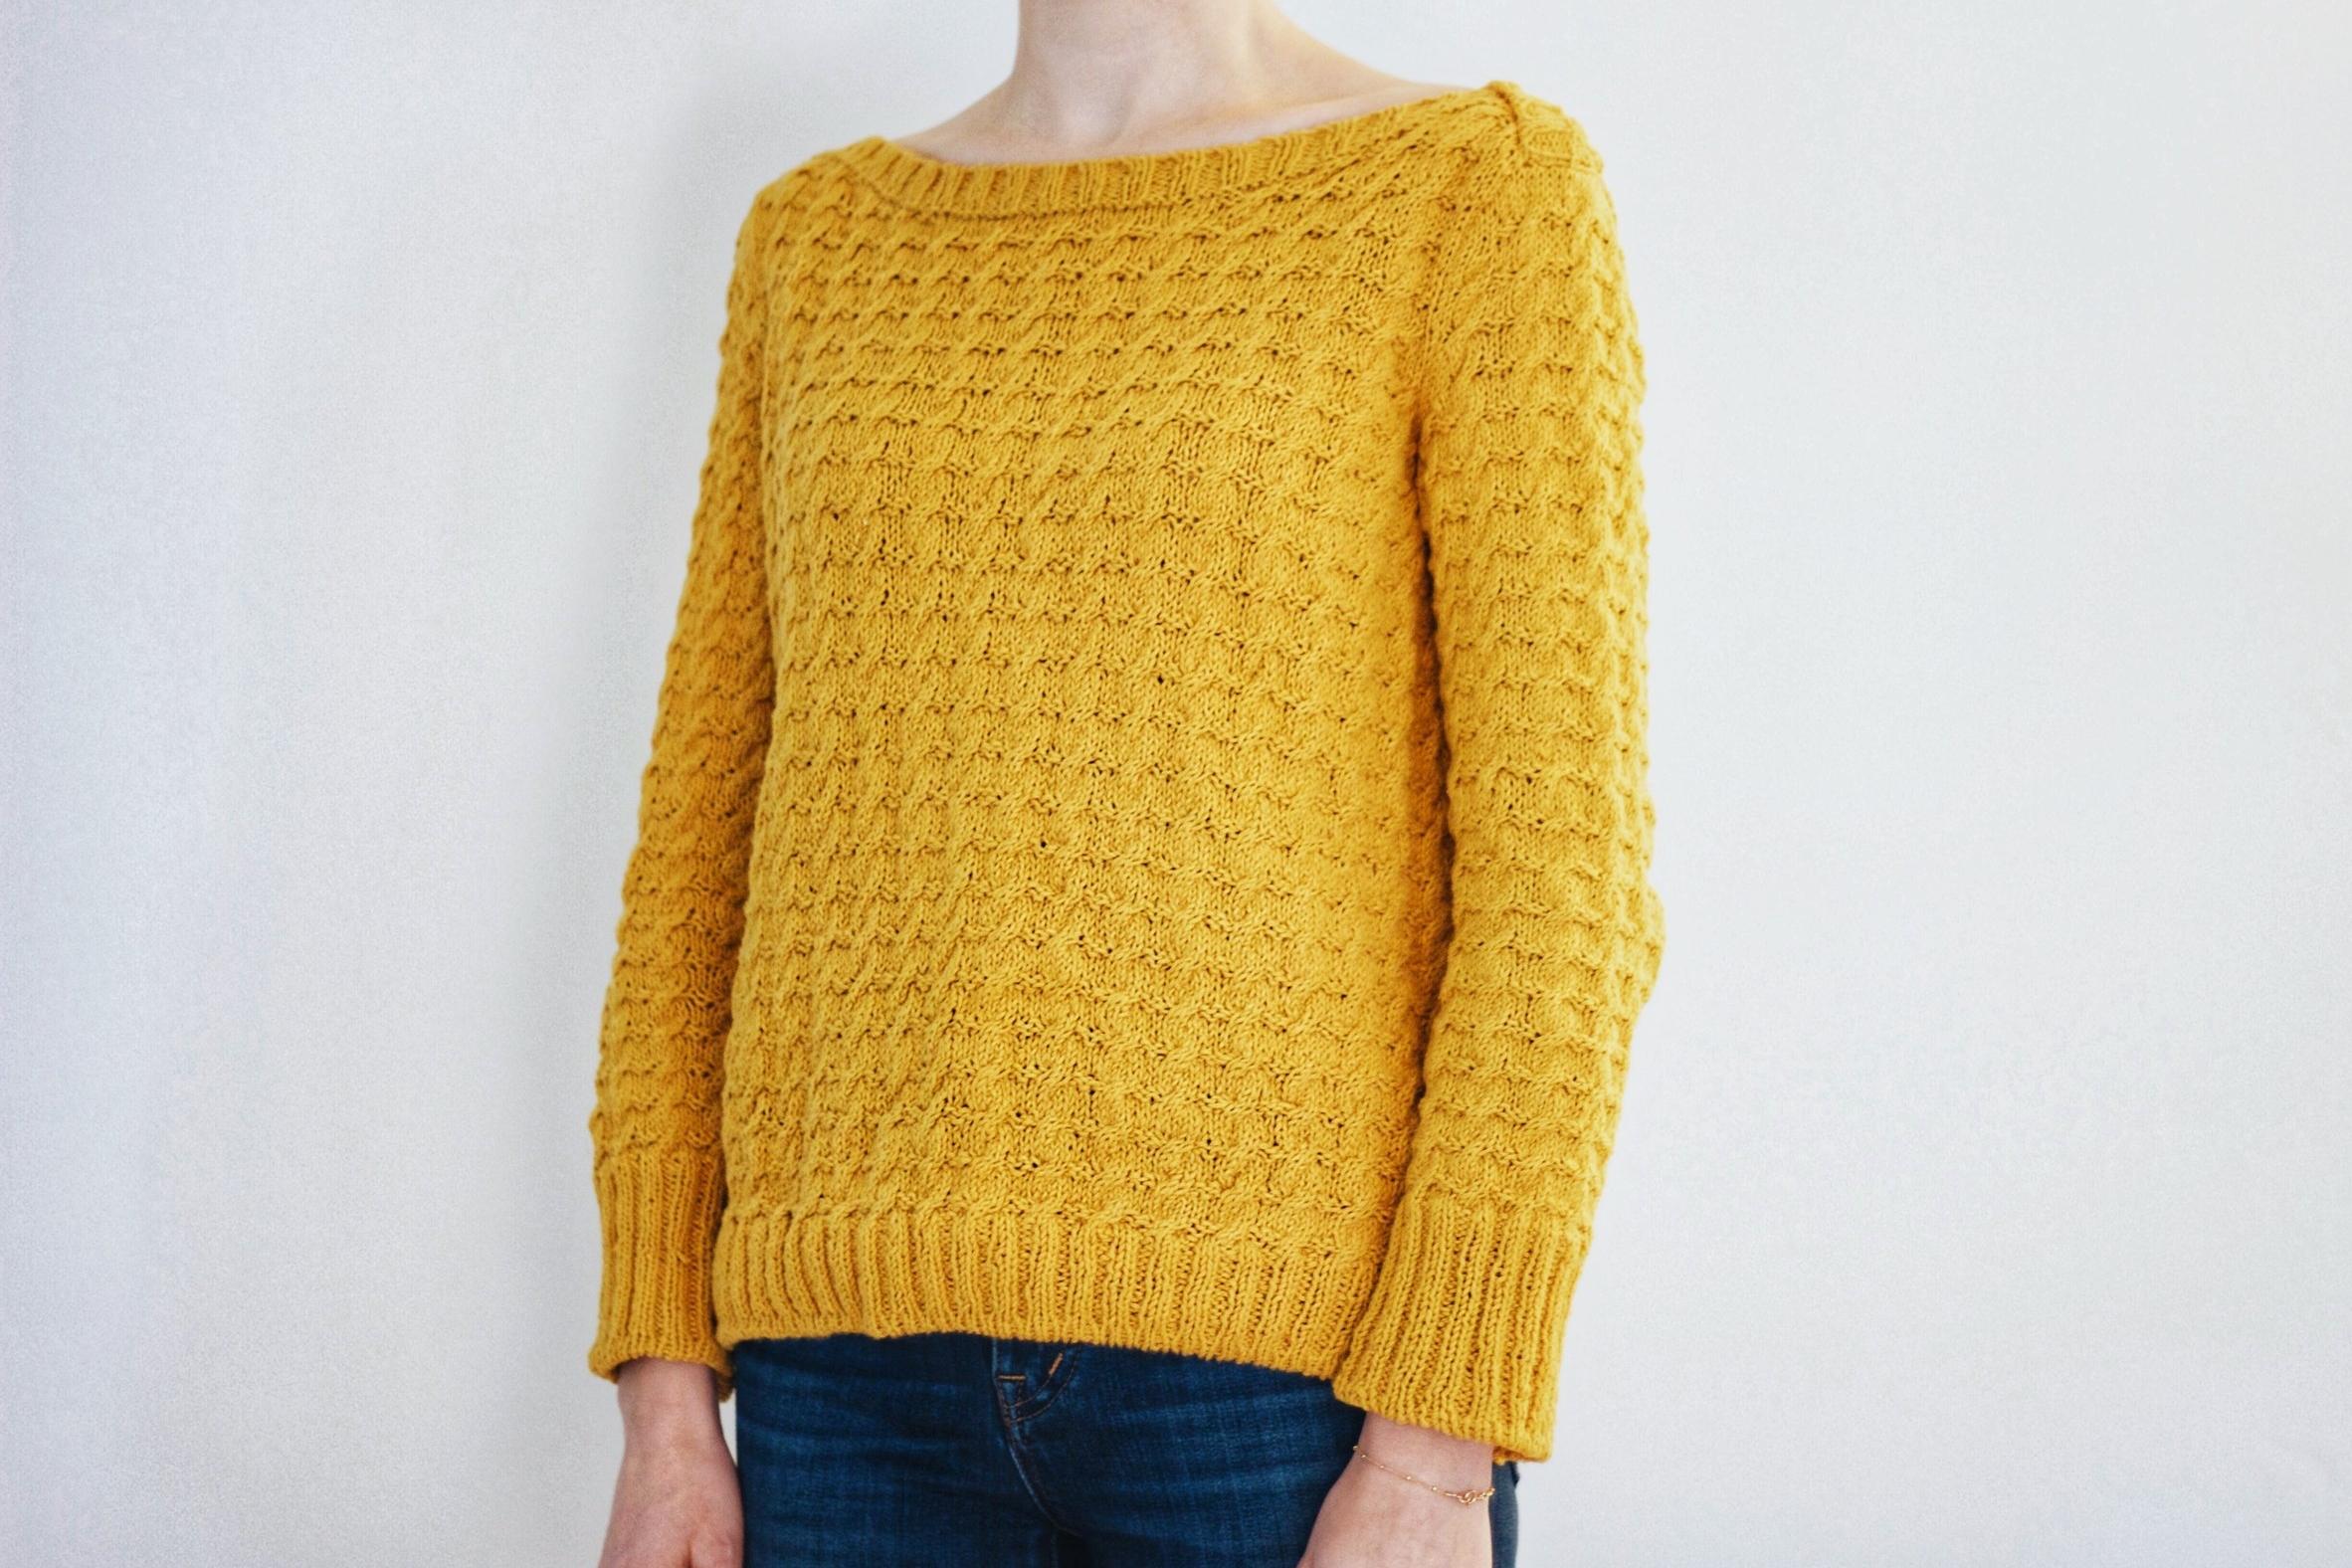 Better Sweater No. 9